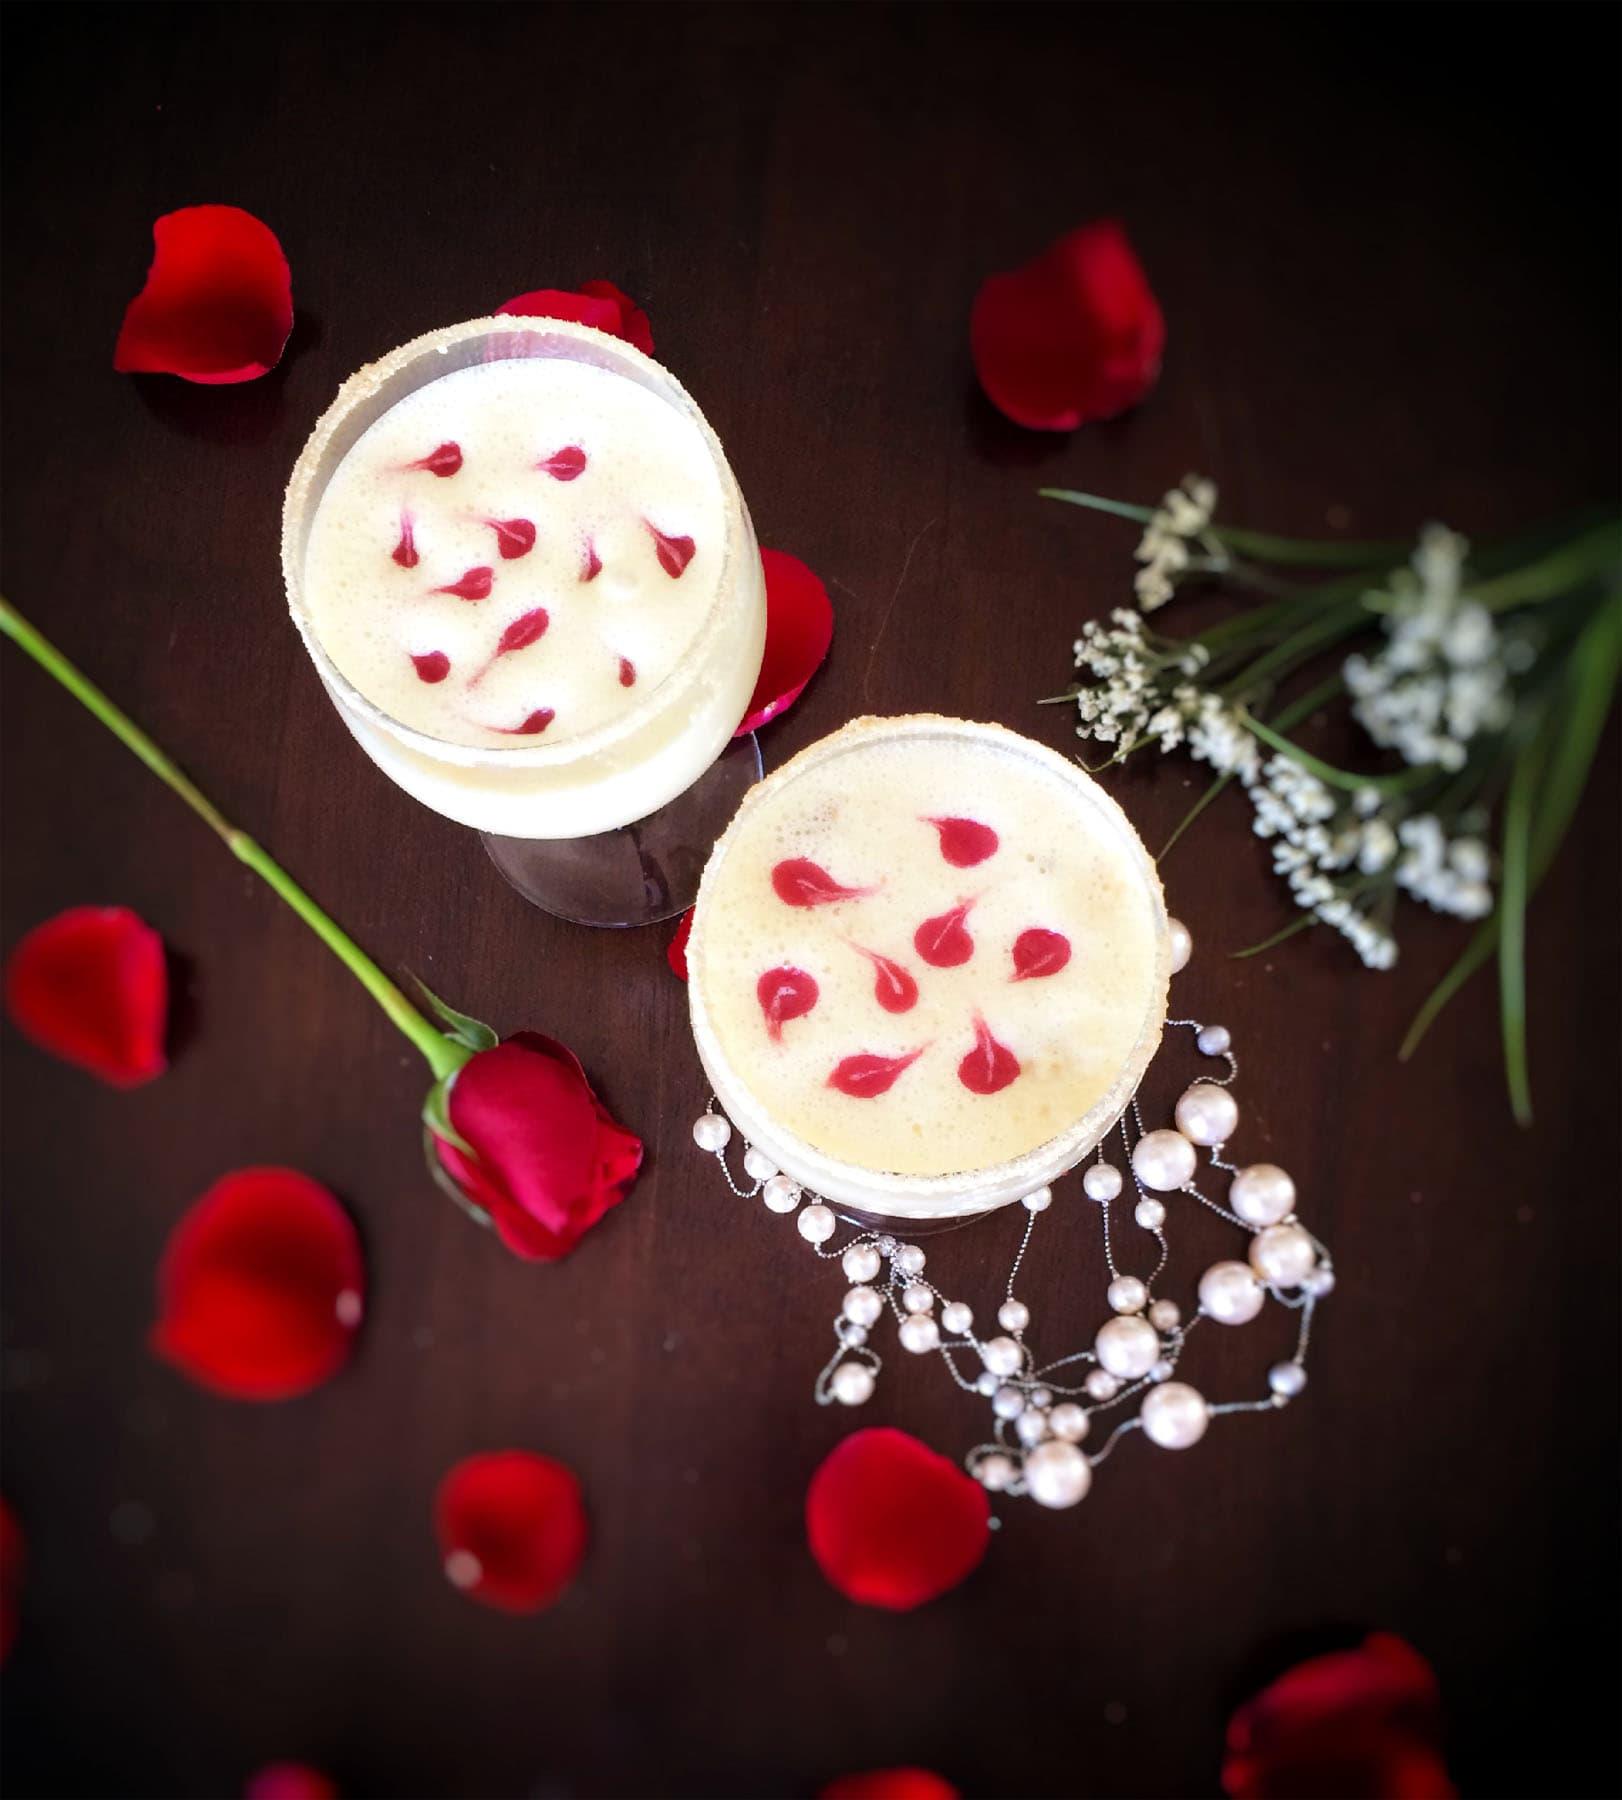 Cheesecake Thandai Mocktail With Berry Swirl